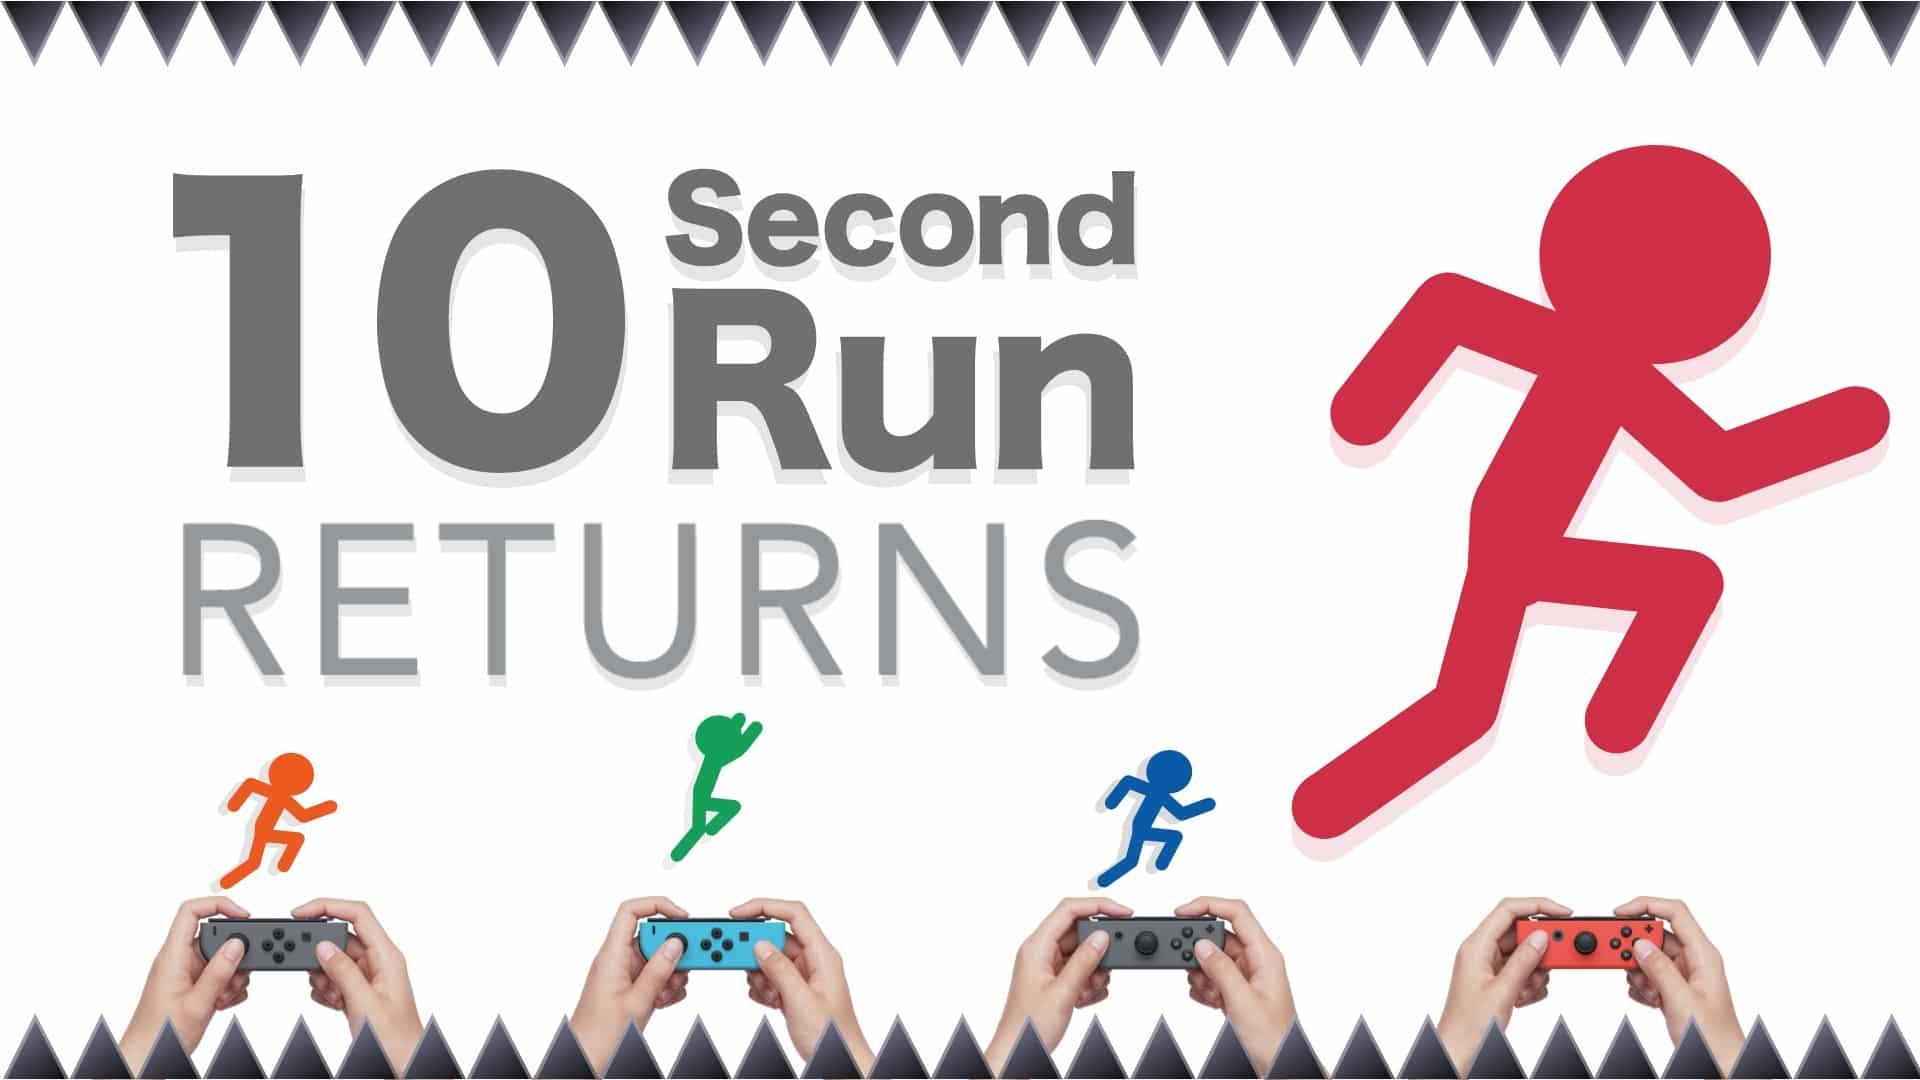 10 Second Run Returns stats facts